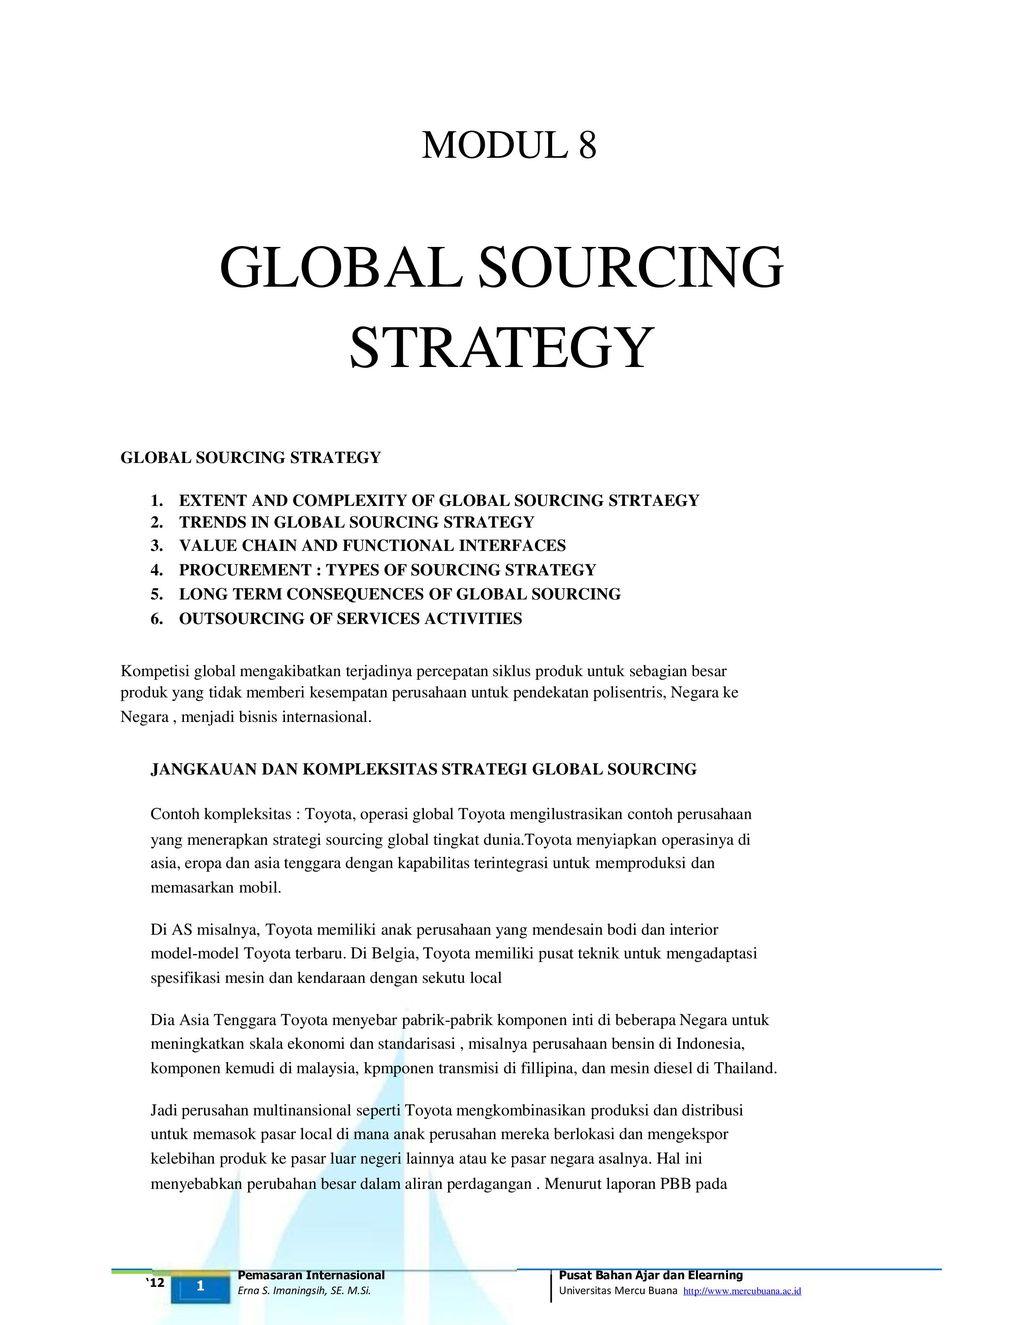 strategi perdagangan menyebar